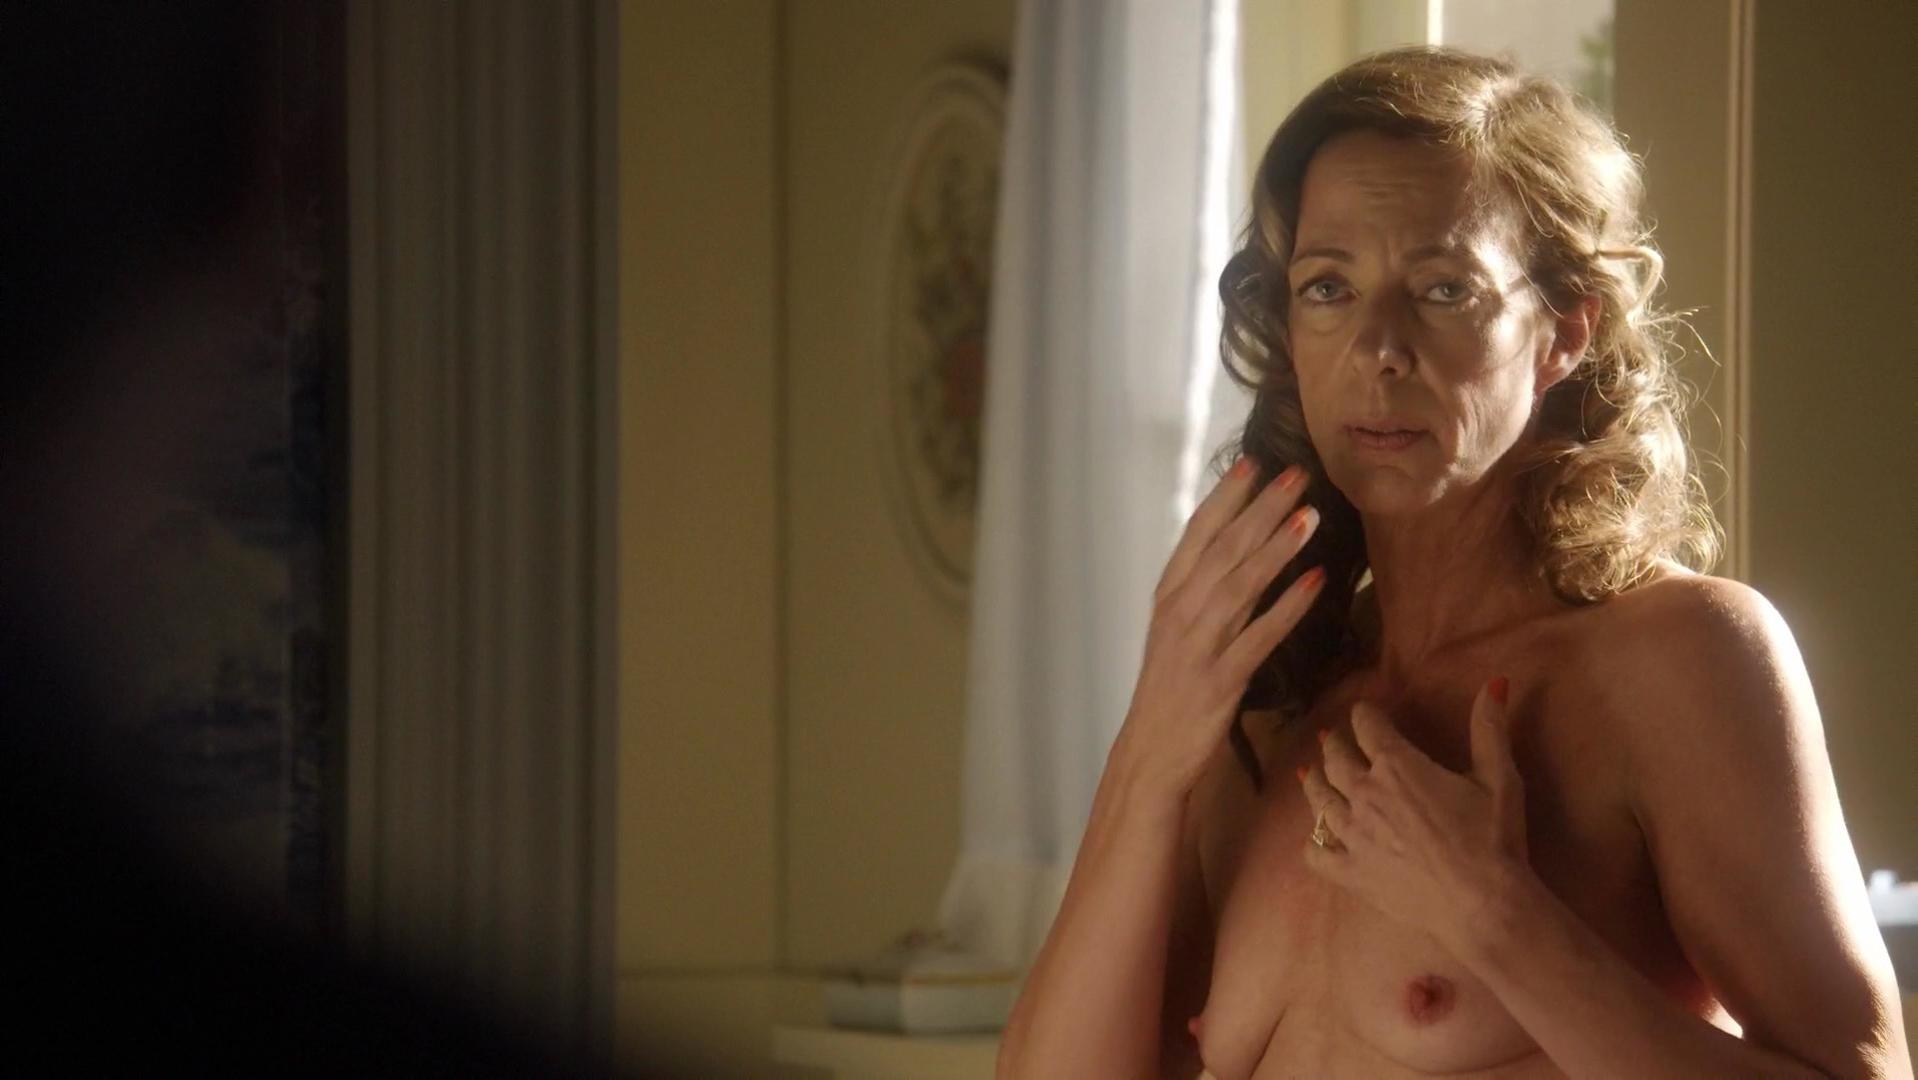 Allison Janney nude - Masters of Sex s01e07-08 (2013)